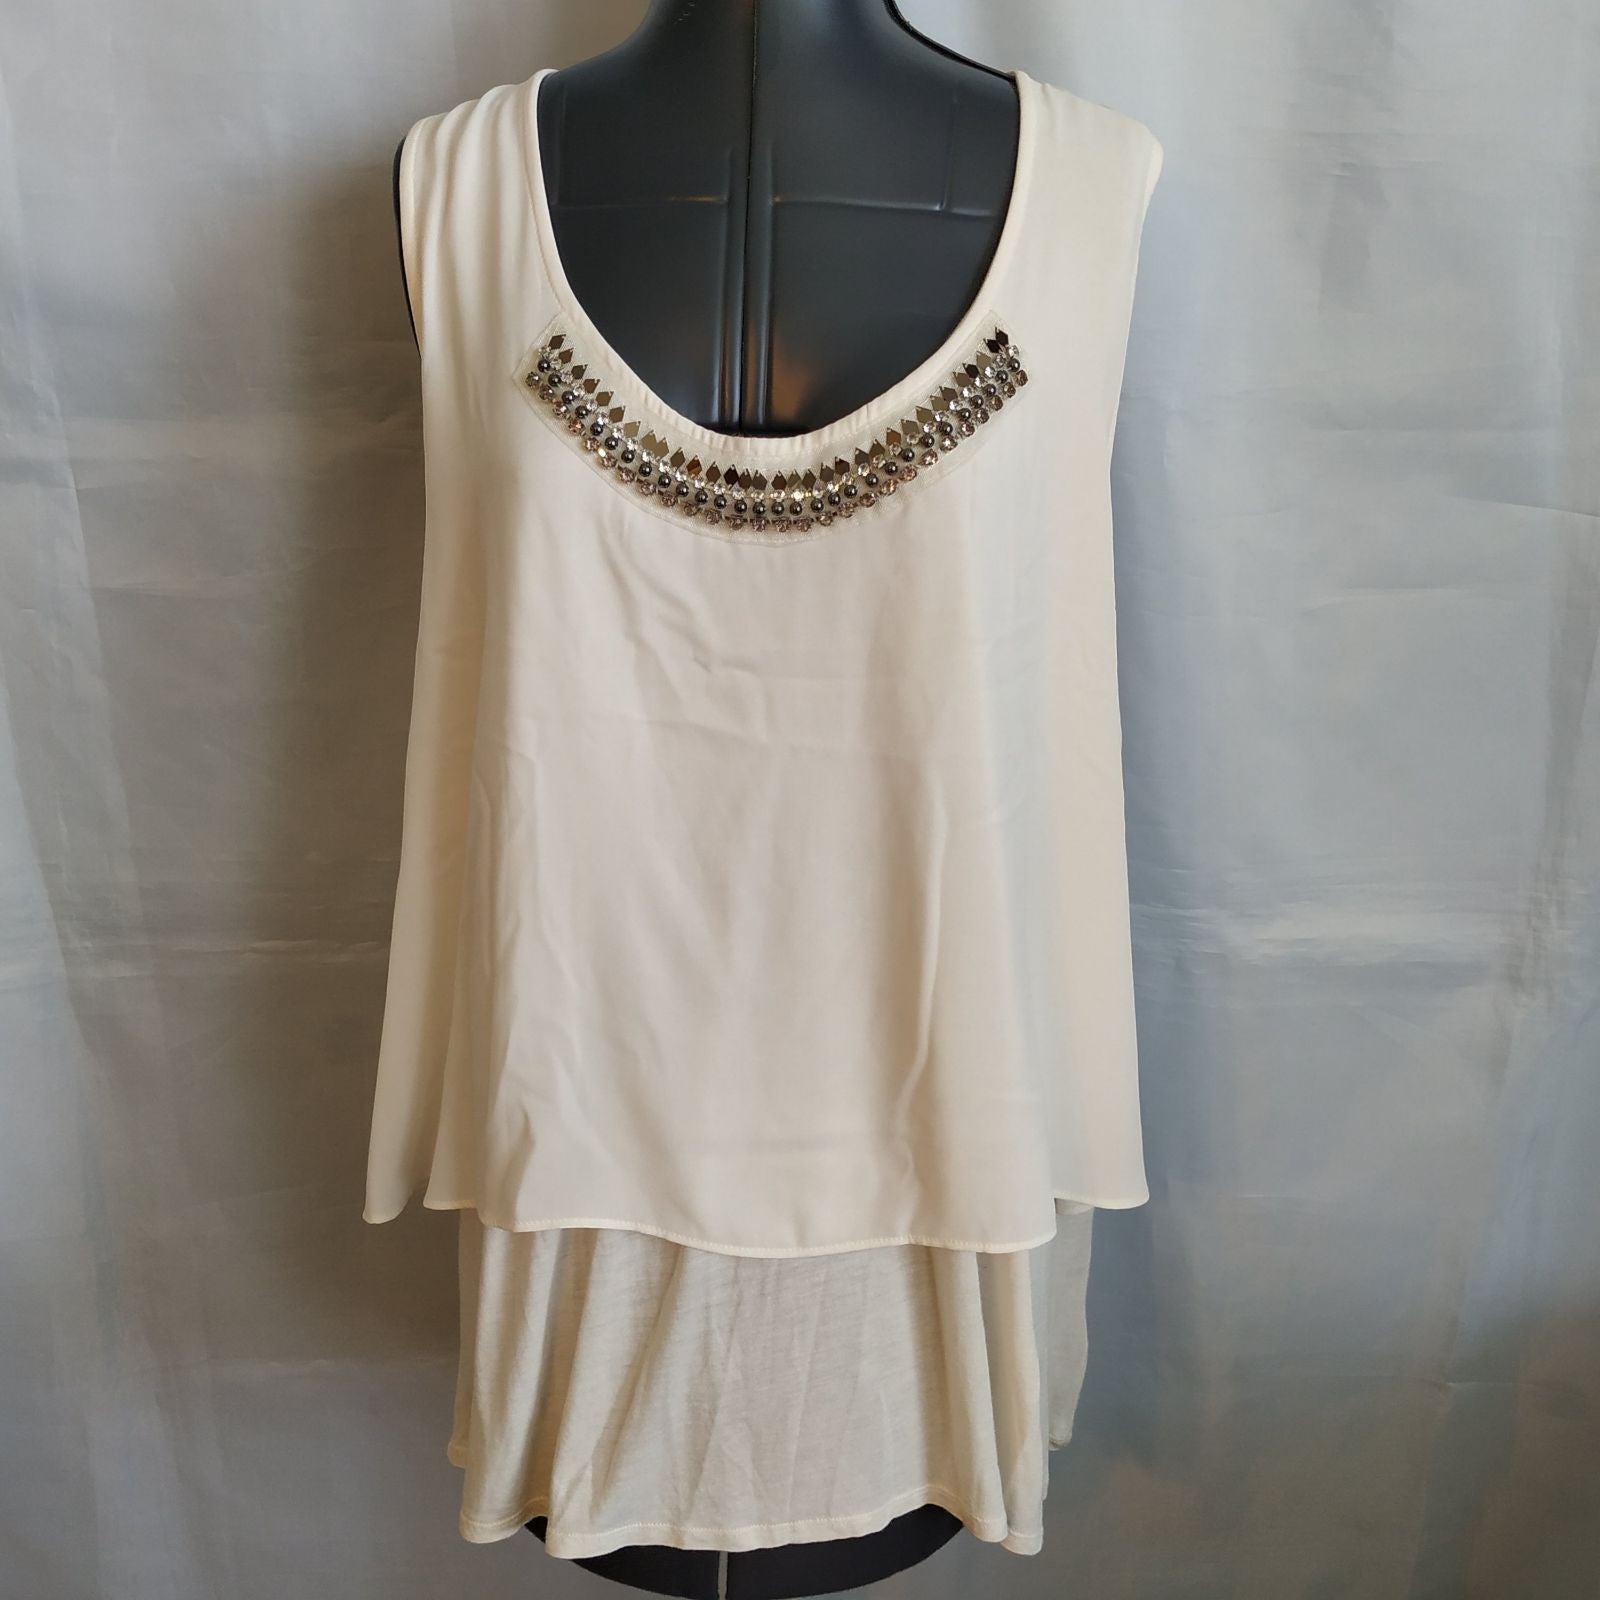 Jessica Simpson Tank Top Shirt 3x beaded